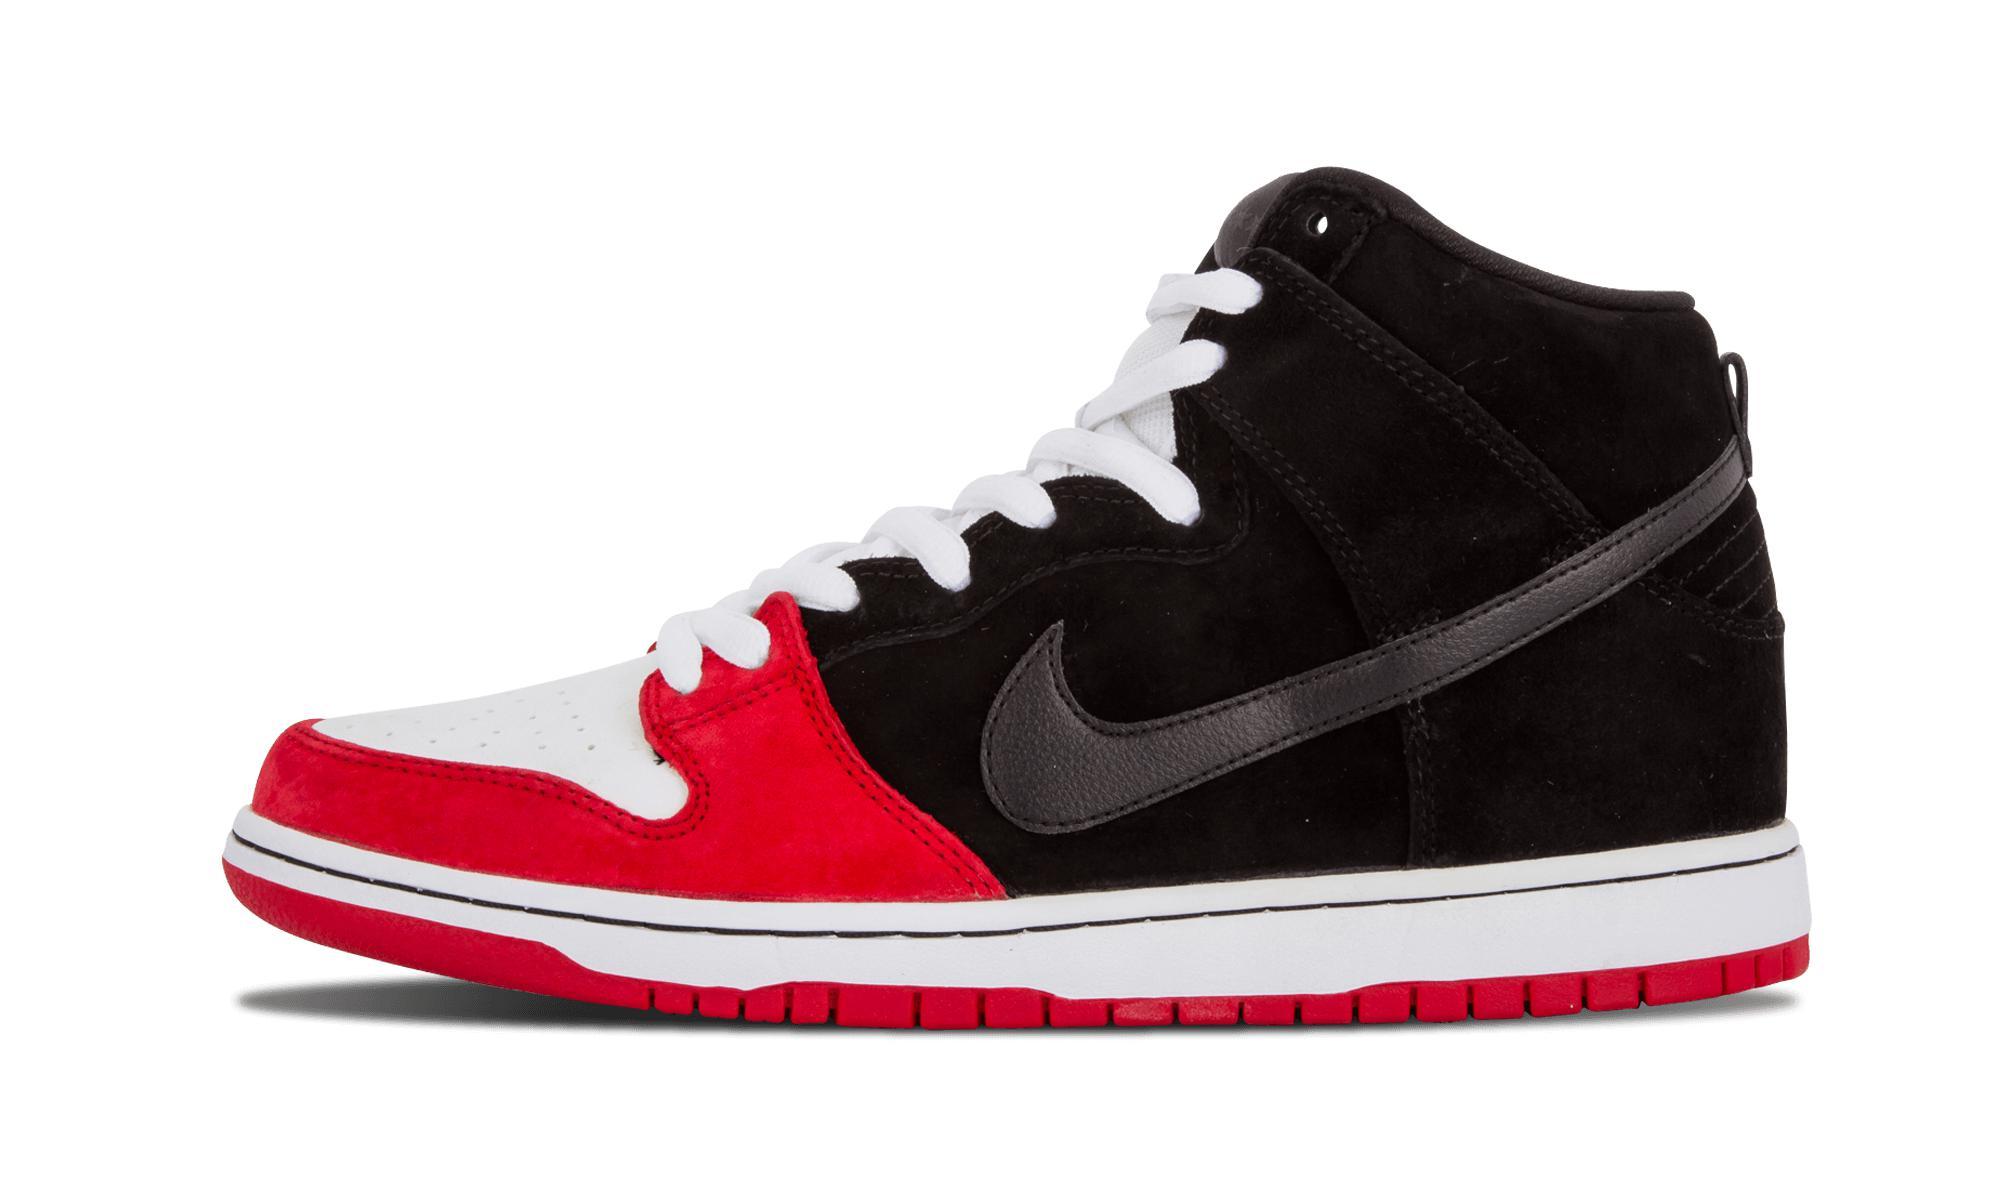 3f38b3e2931bb Lyst - Nike Dunk High Premium Sb in Black for Men